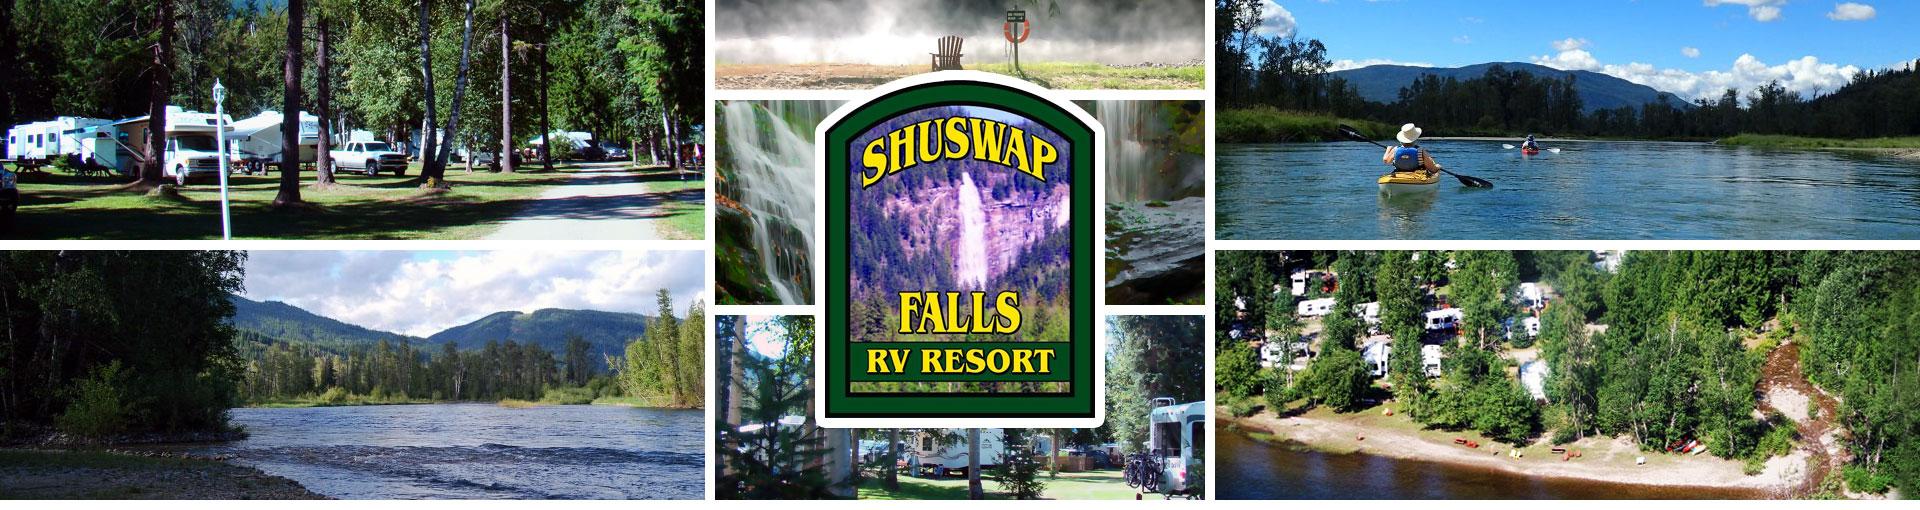 Shuswap Falls R.V. Resort Collage